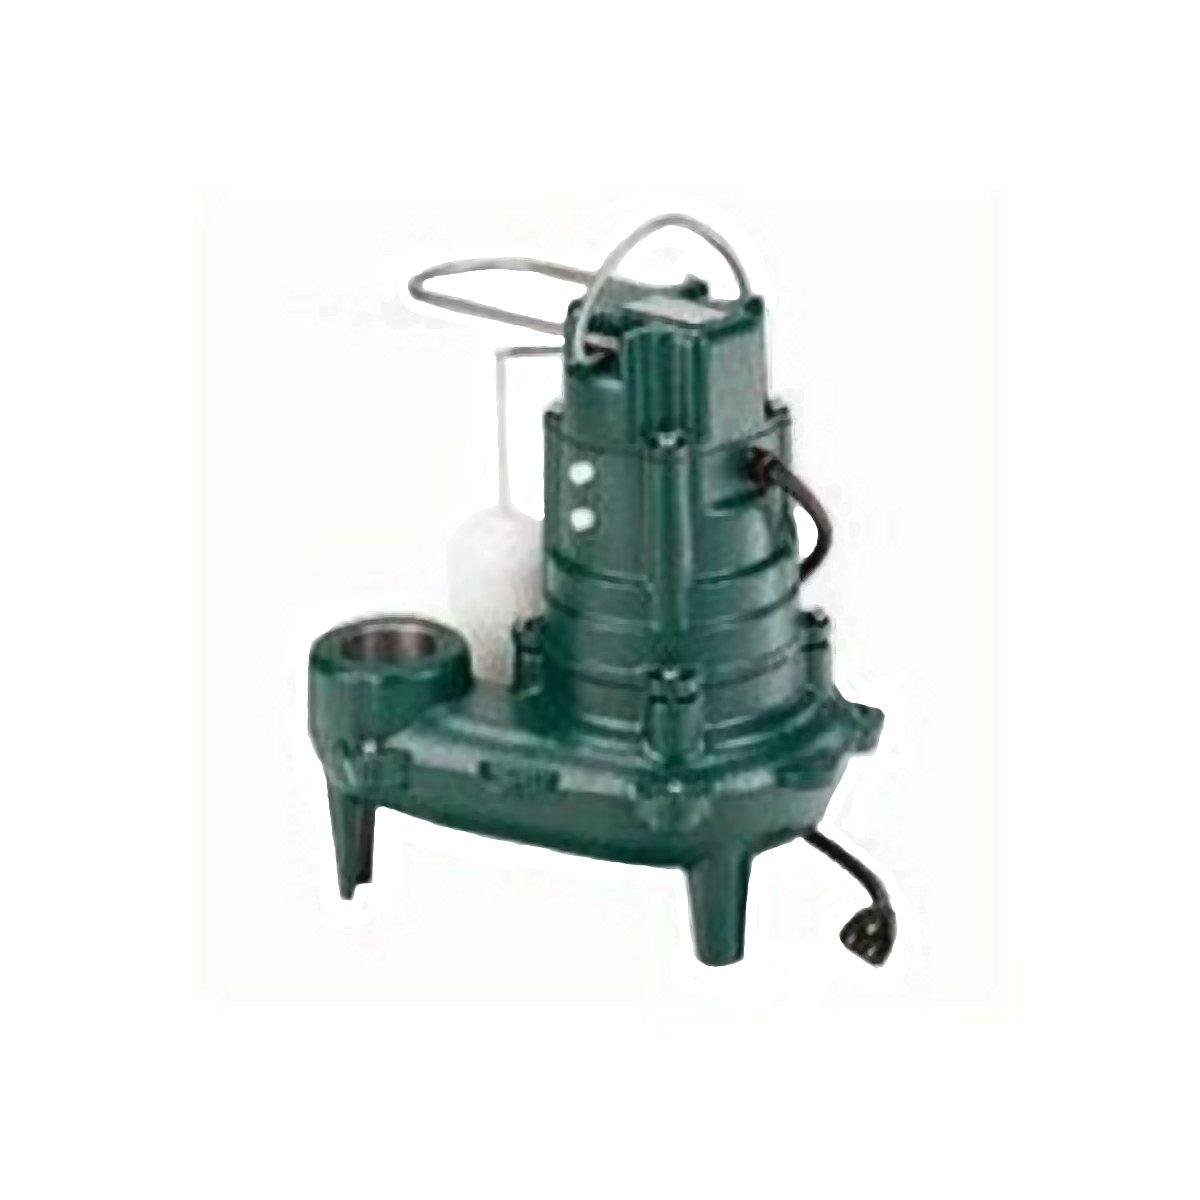 Zoeller 267-0001 M267 Waste-Mate Sewage Pump, 1/2 Horsepower, 115V by Zoeller